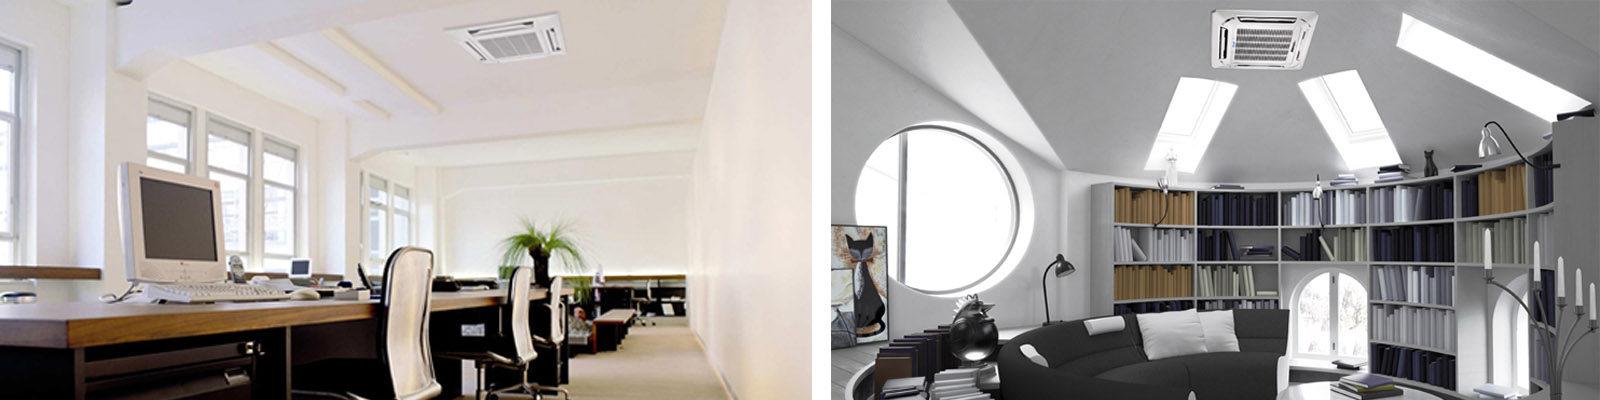 climweb bien choisir sa climatisation page 2 sur 5. Black Bedroom Furniture Sets. Home Design Ideas